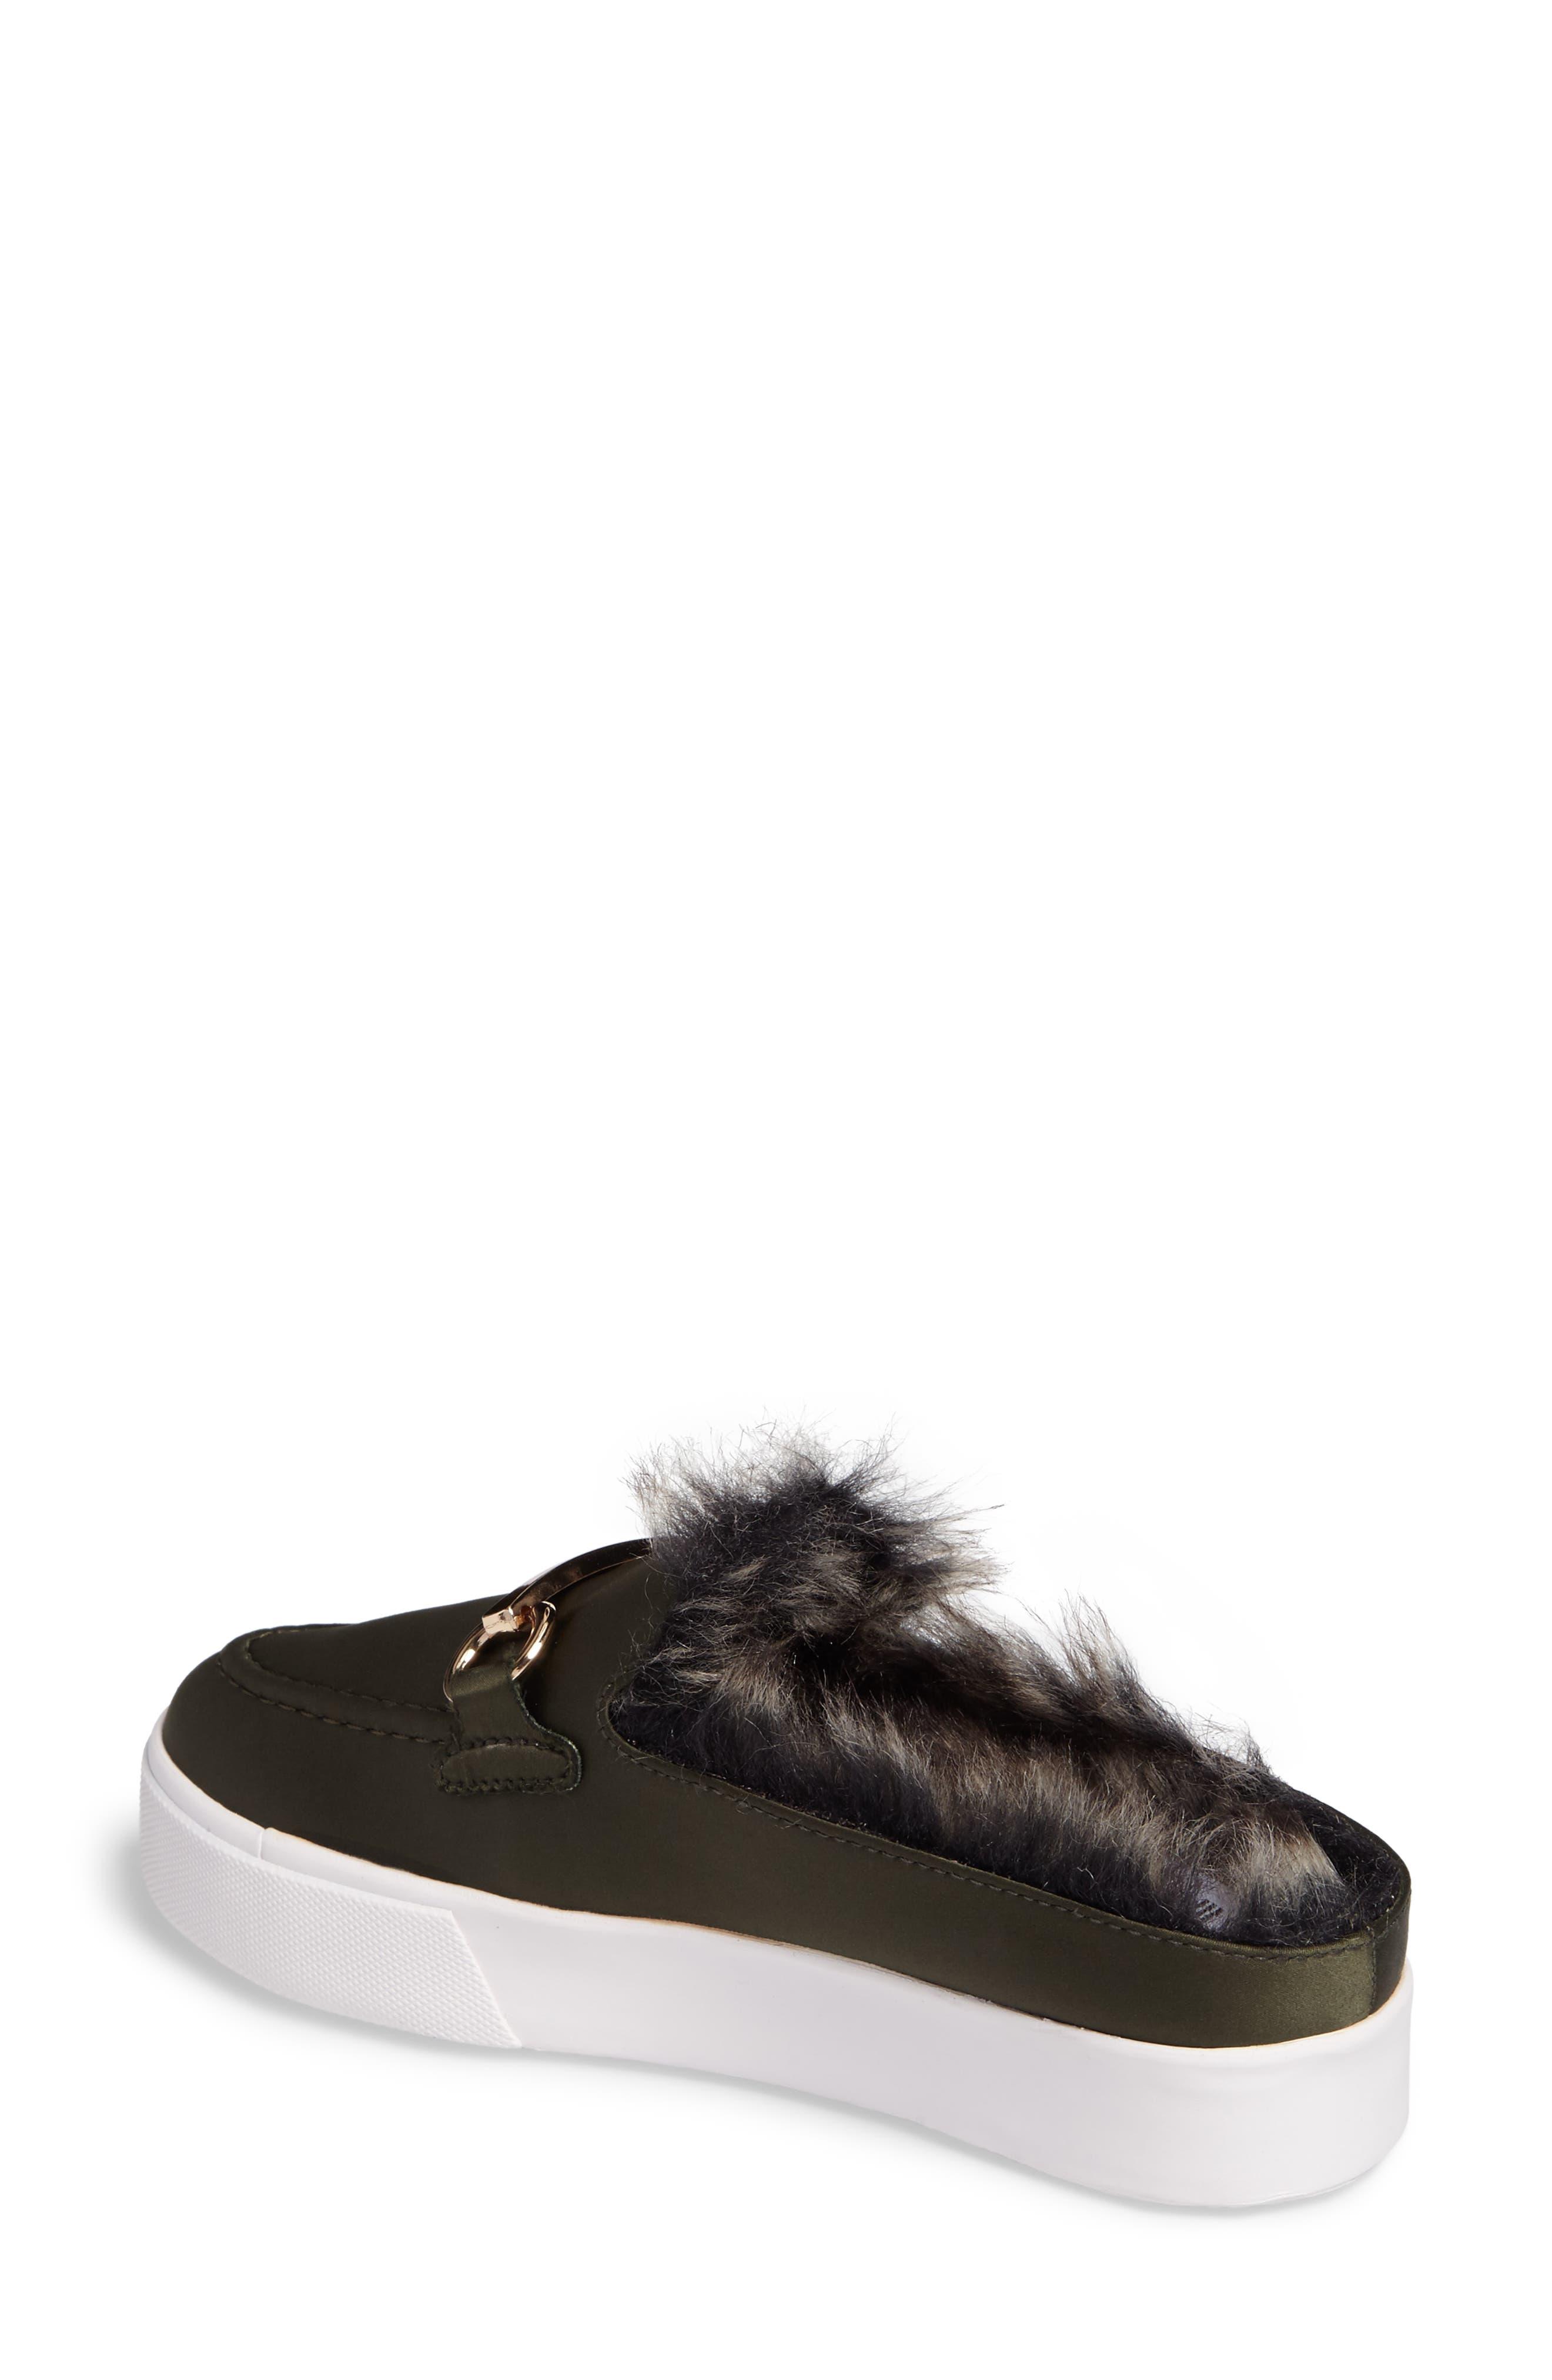 Tico Faux Fur Sneaker Mule,                             Alternate thumbnail 2, color,                             Olive Satin-Gold-Grey